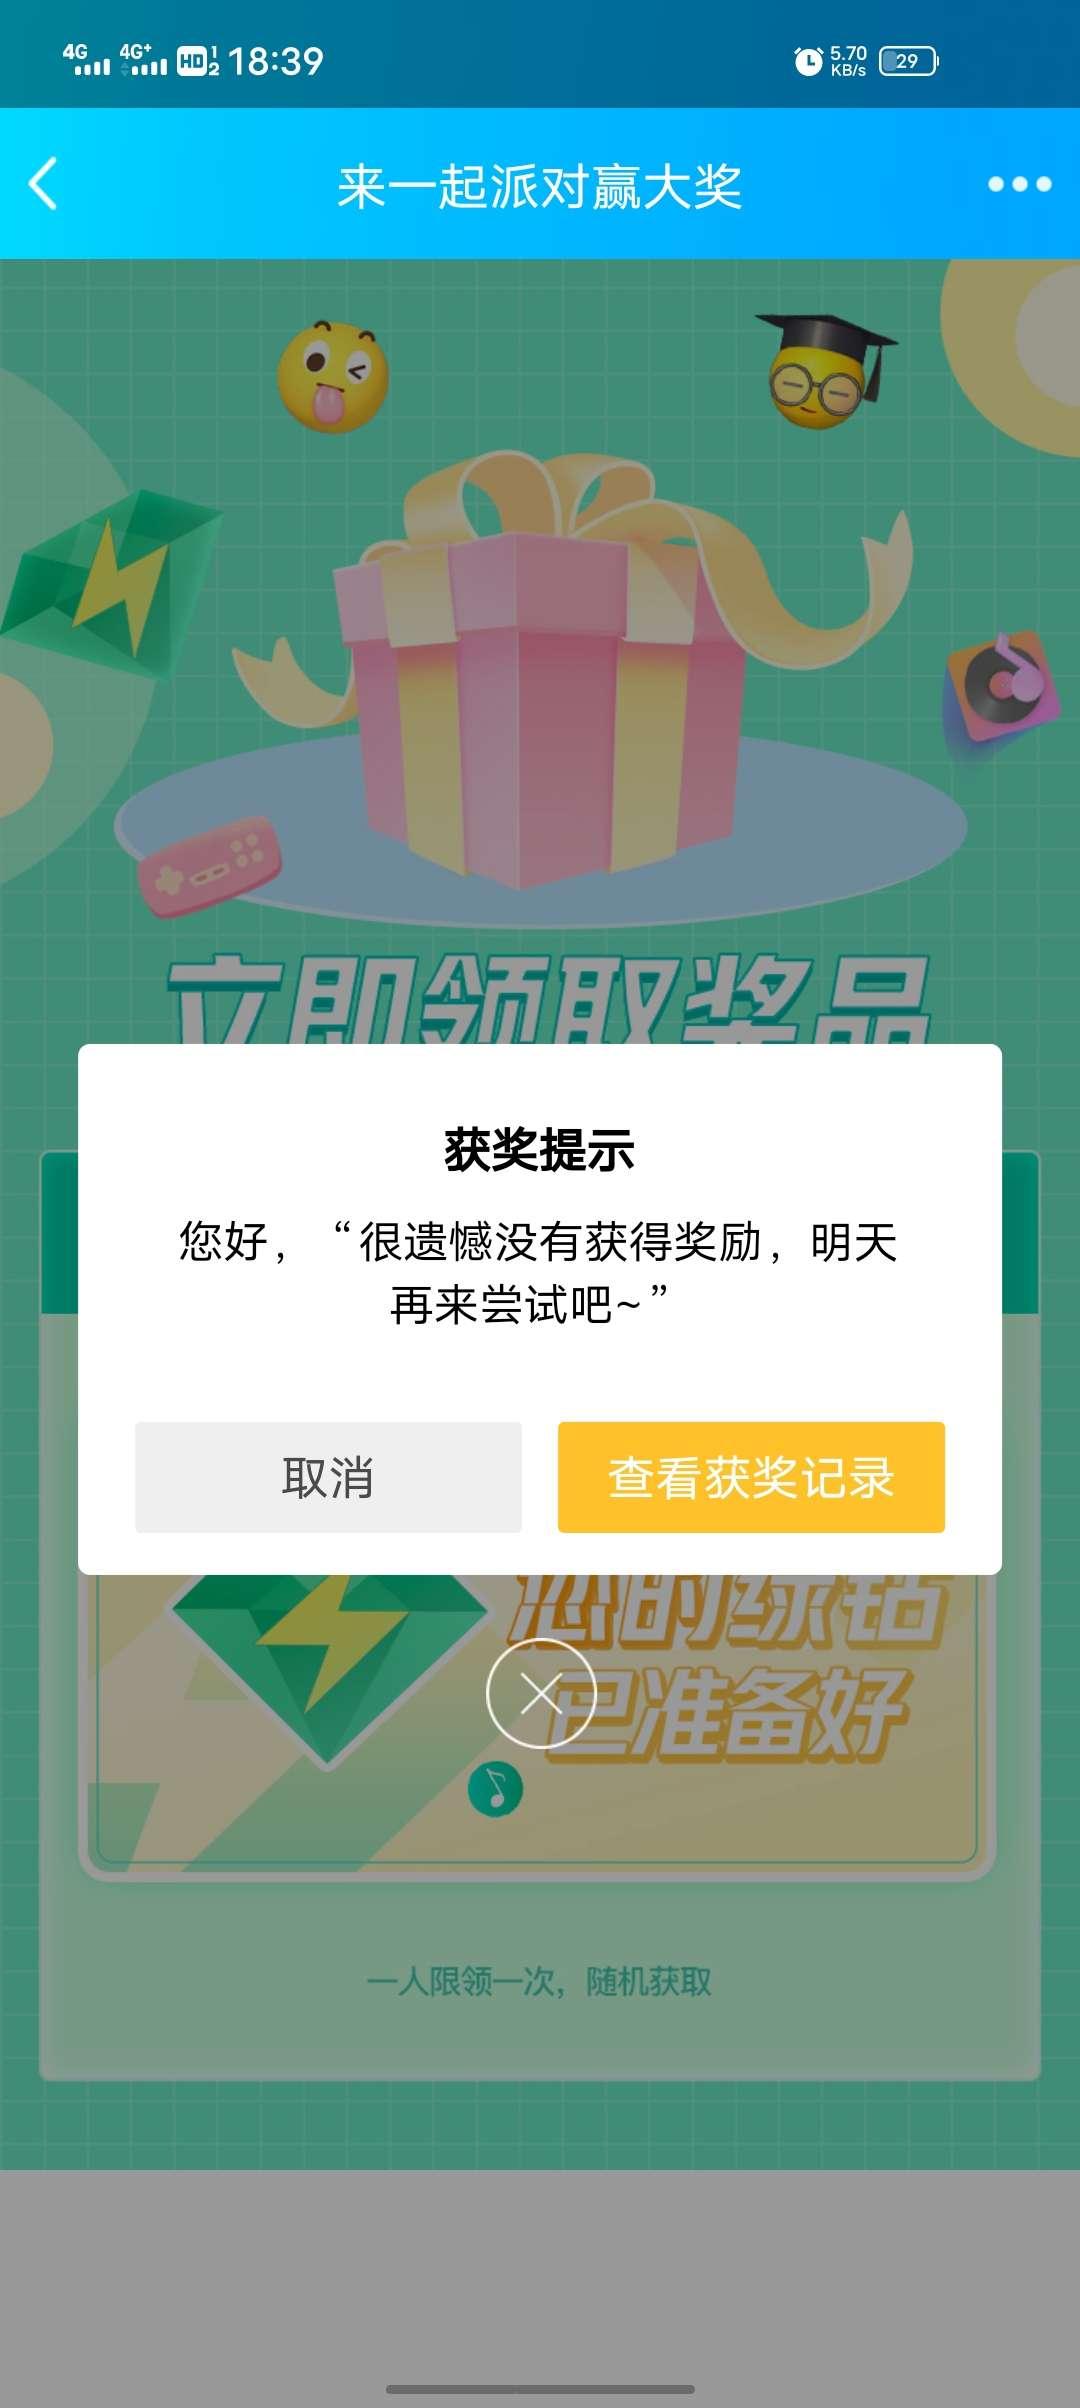 QQ答题赢QQ音乐绿钻